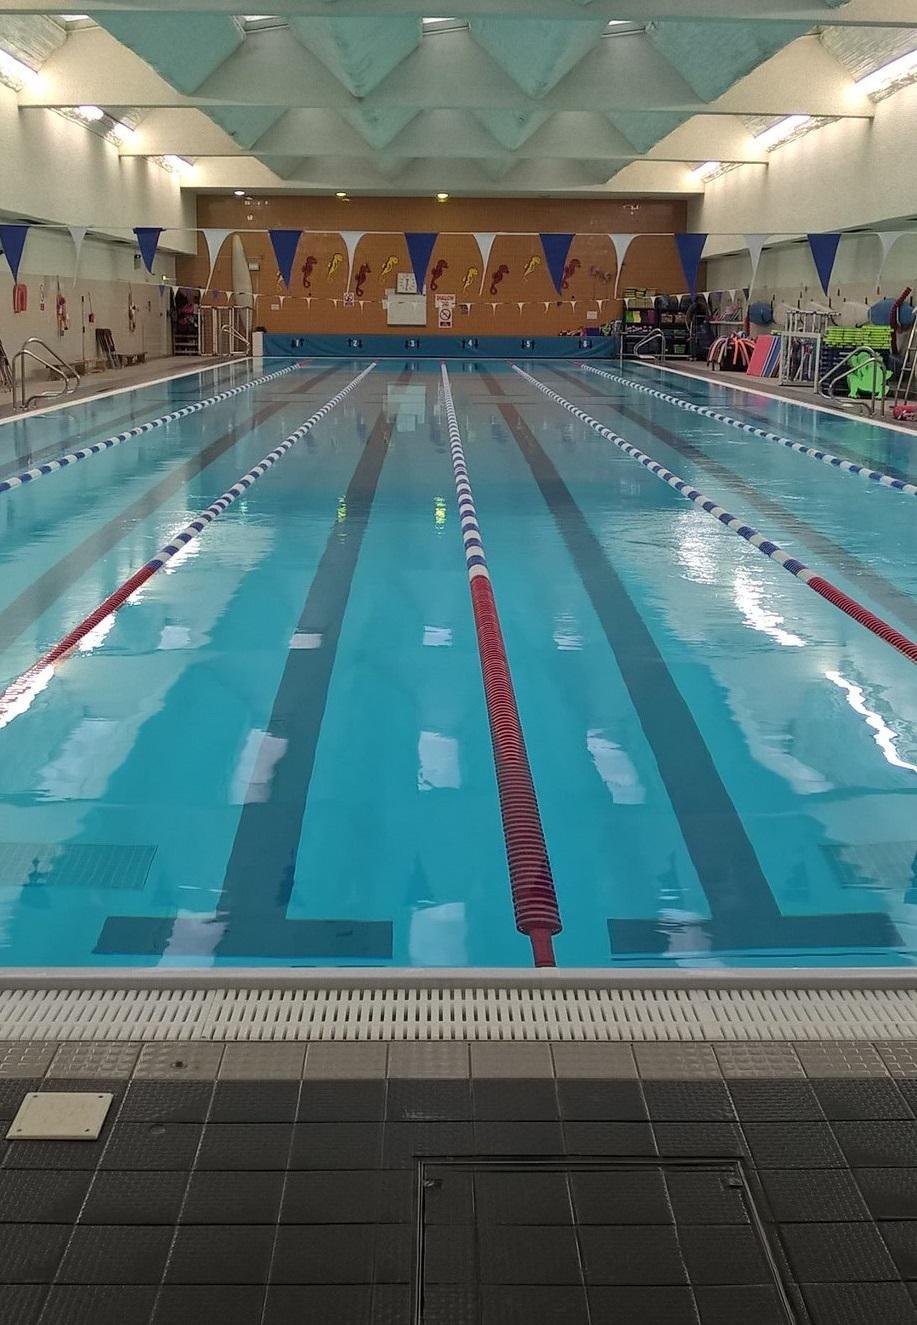 Master your swimming technique